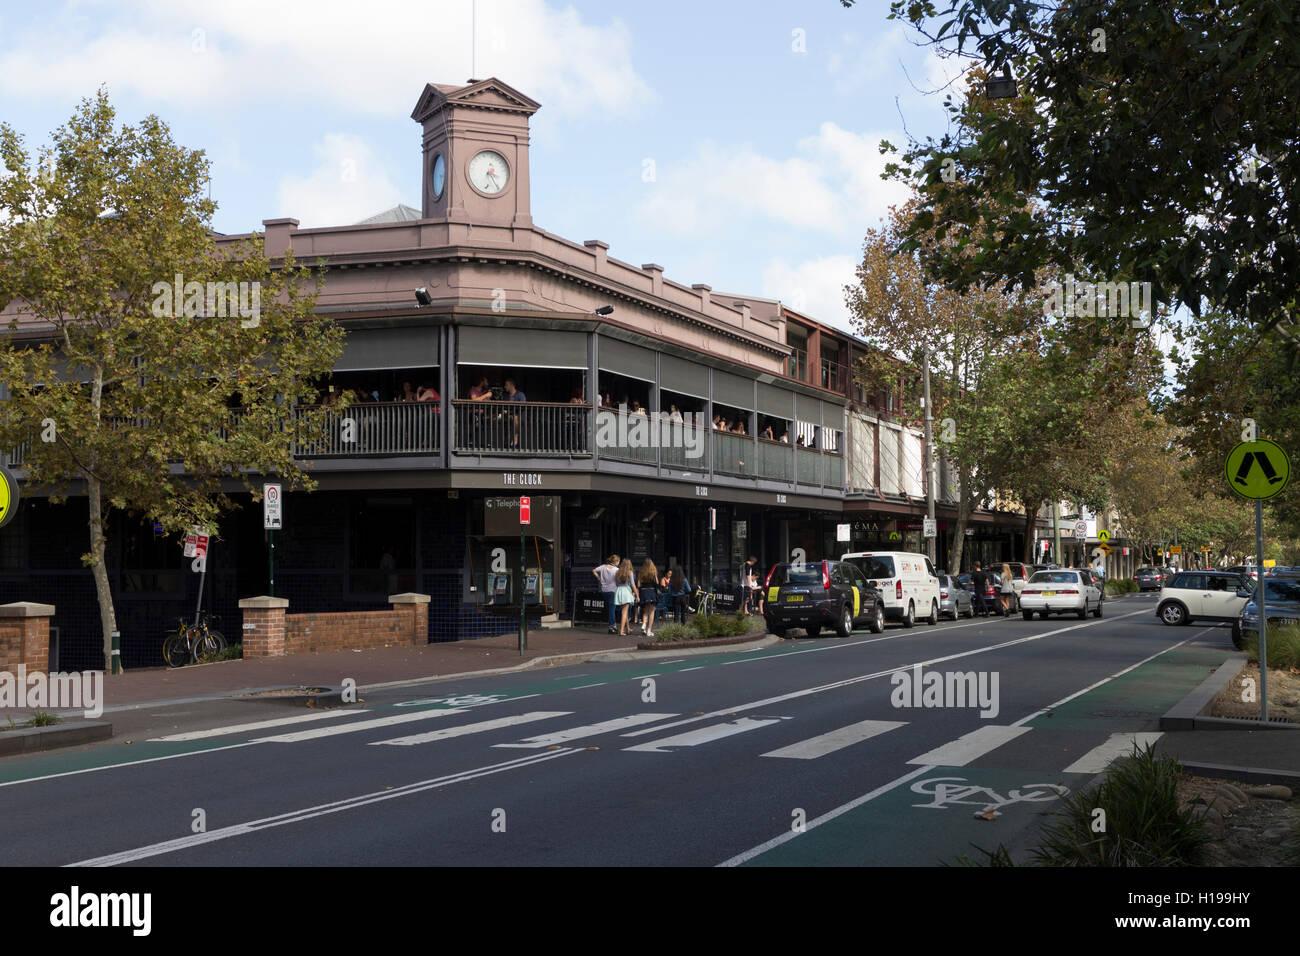 The Clock Hotel On Crown Street Surry Hills Sydney Australia Stock